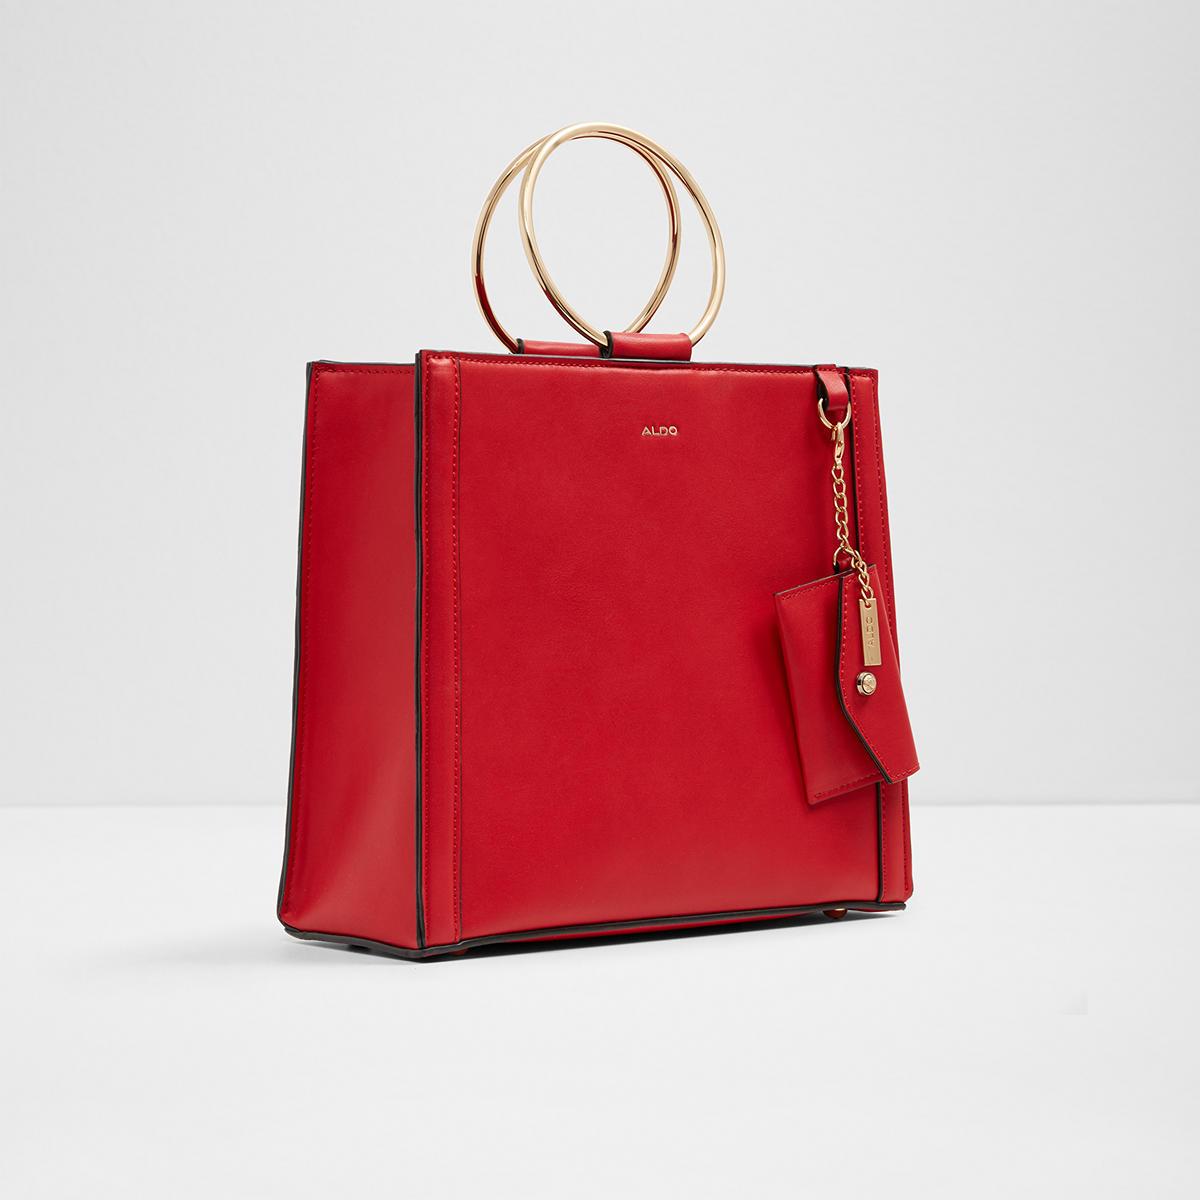 206985a8599 Acilla Red Women s Top handle